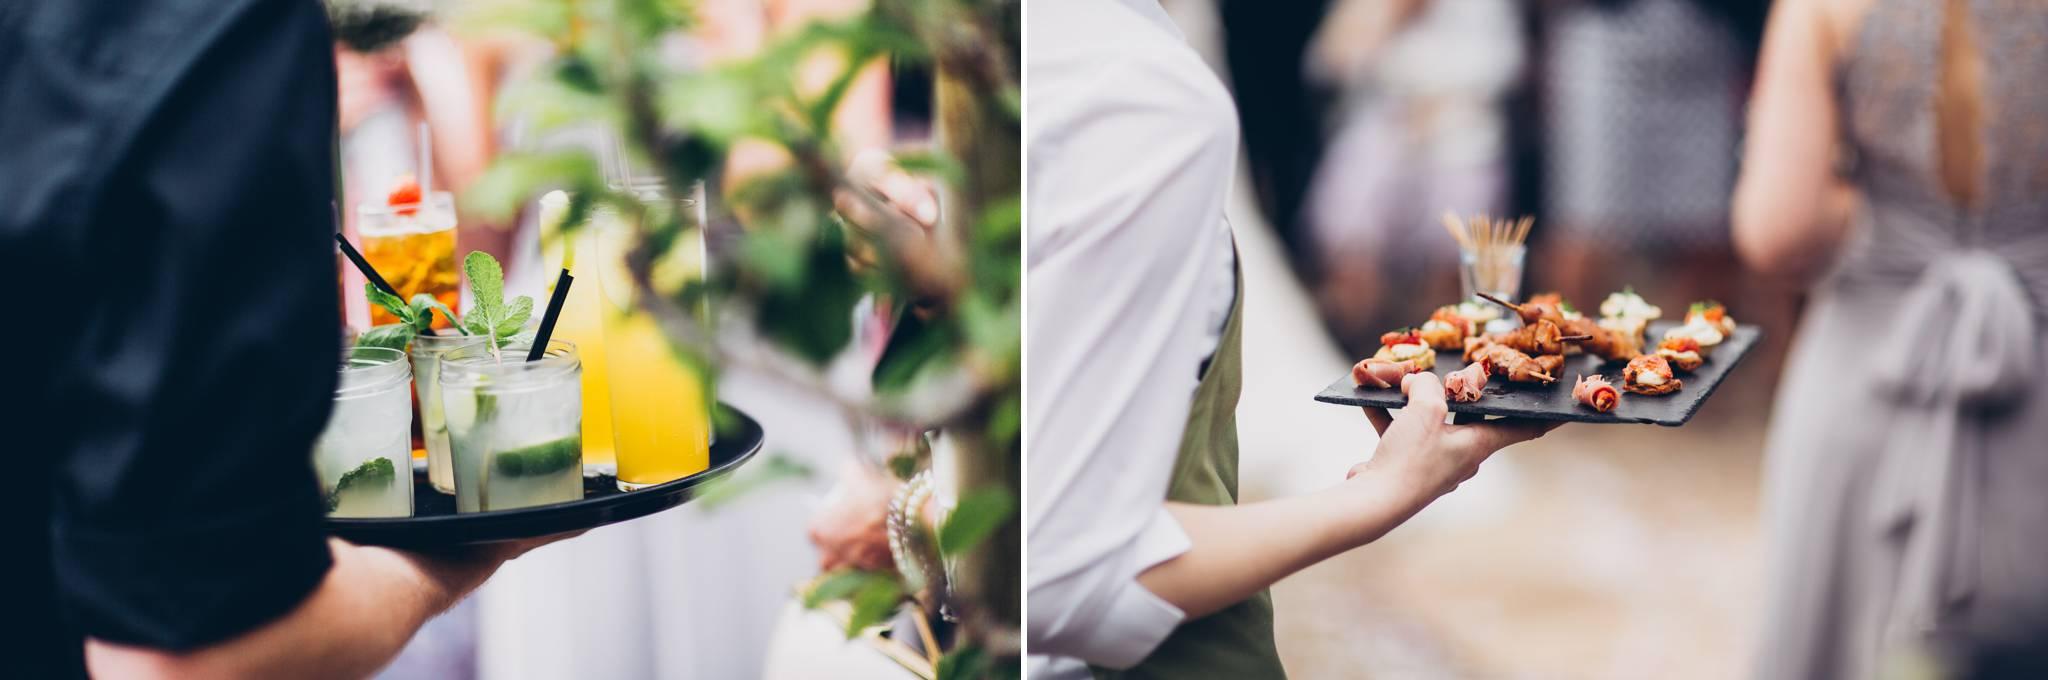 shropshire-wedding-photography 15.jpg